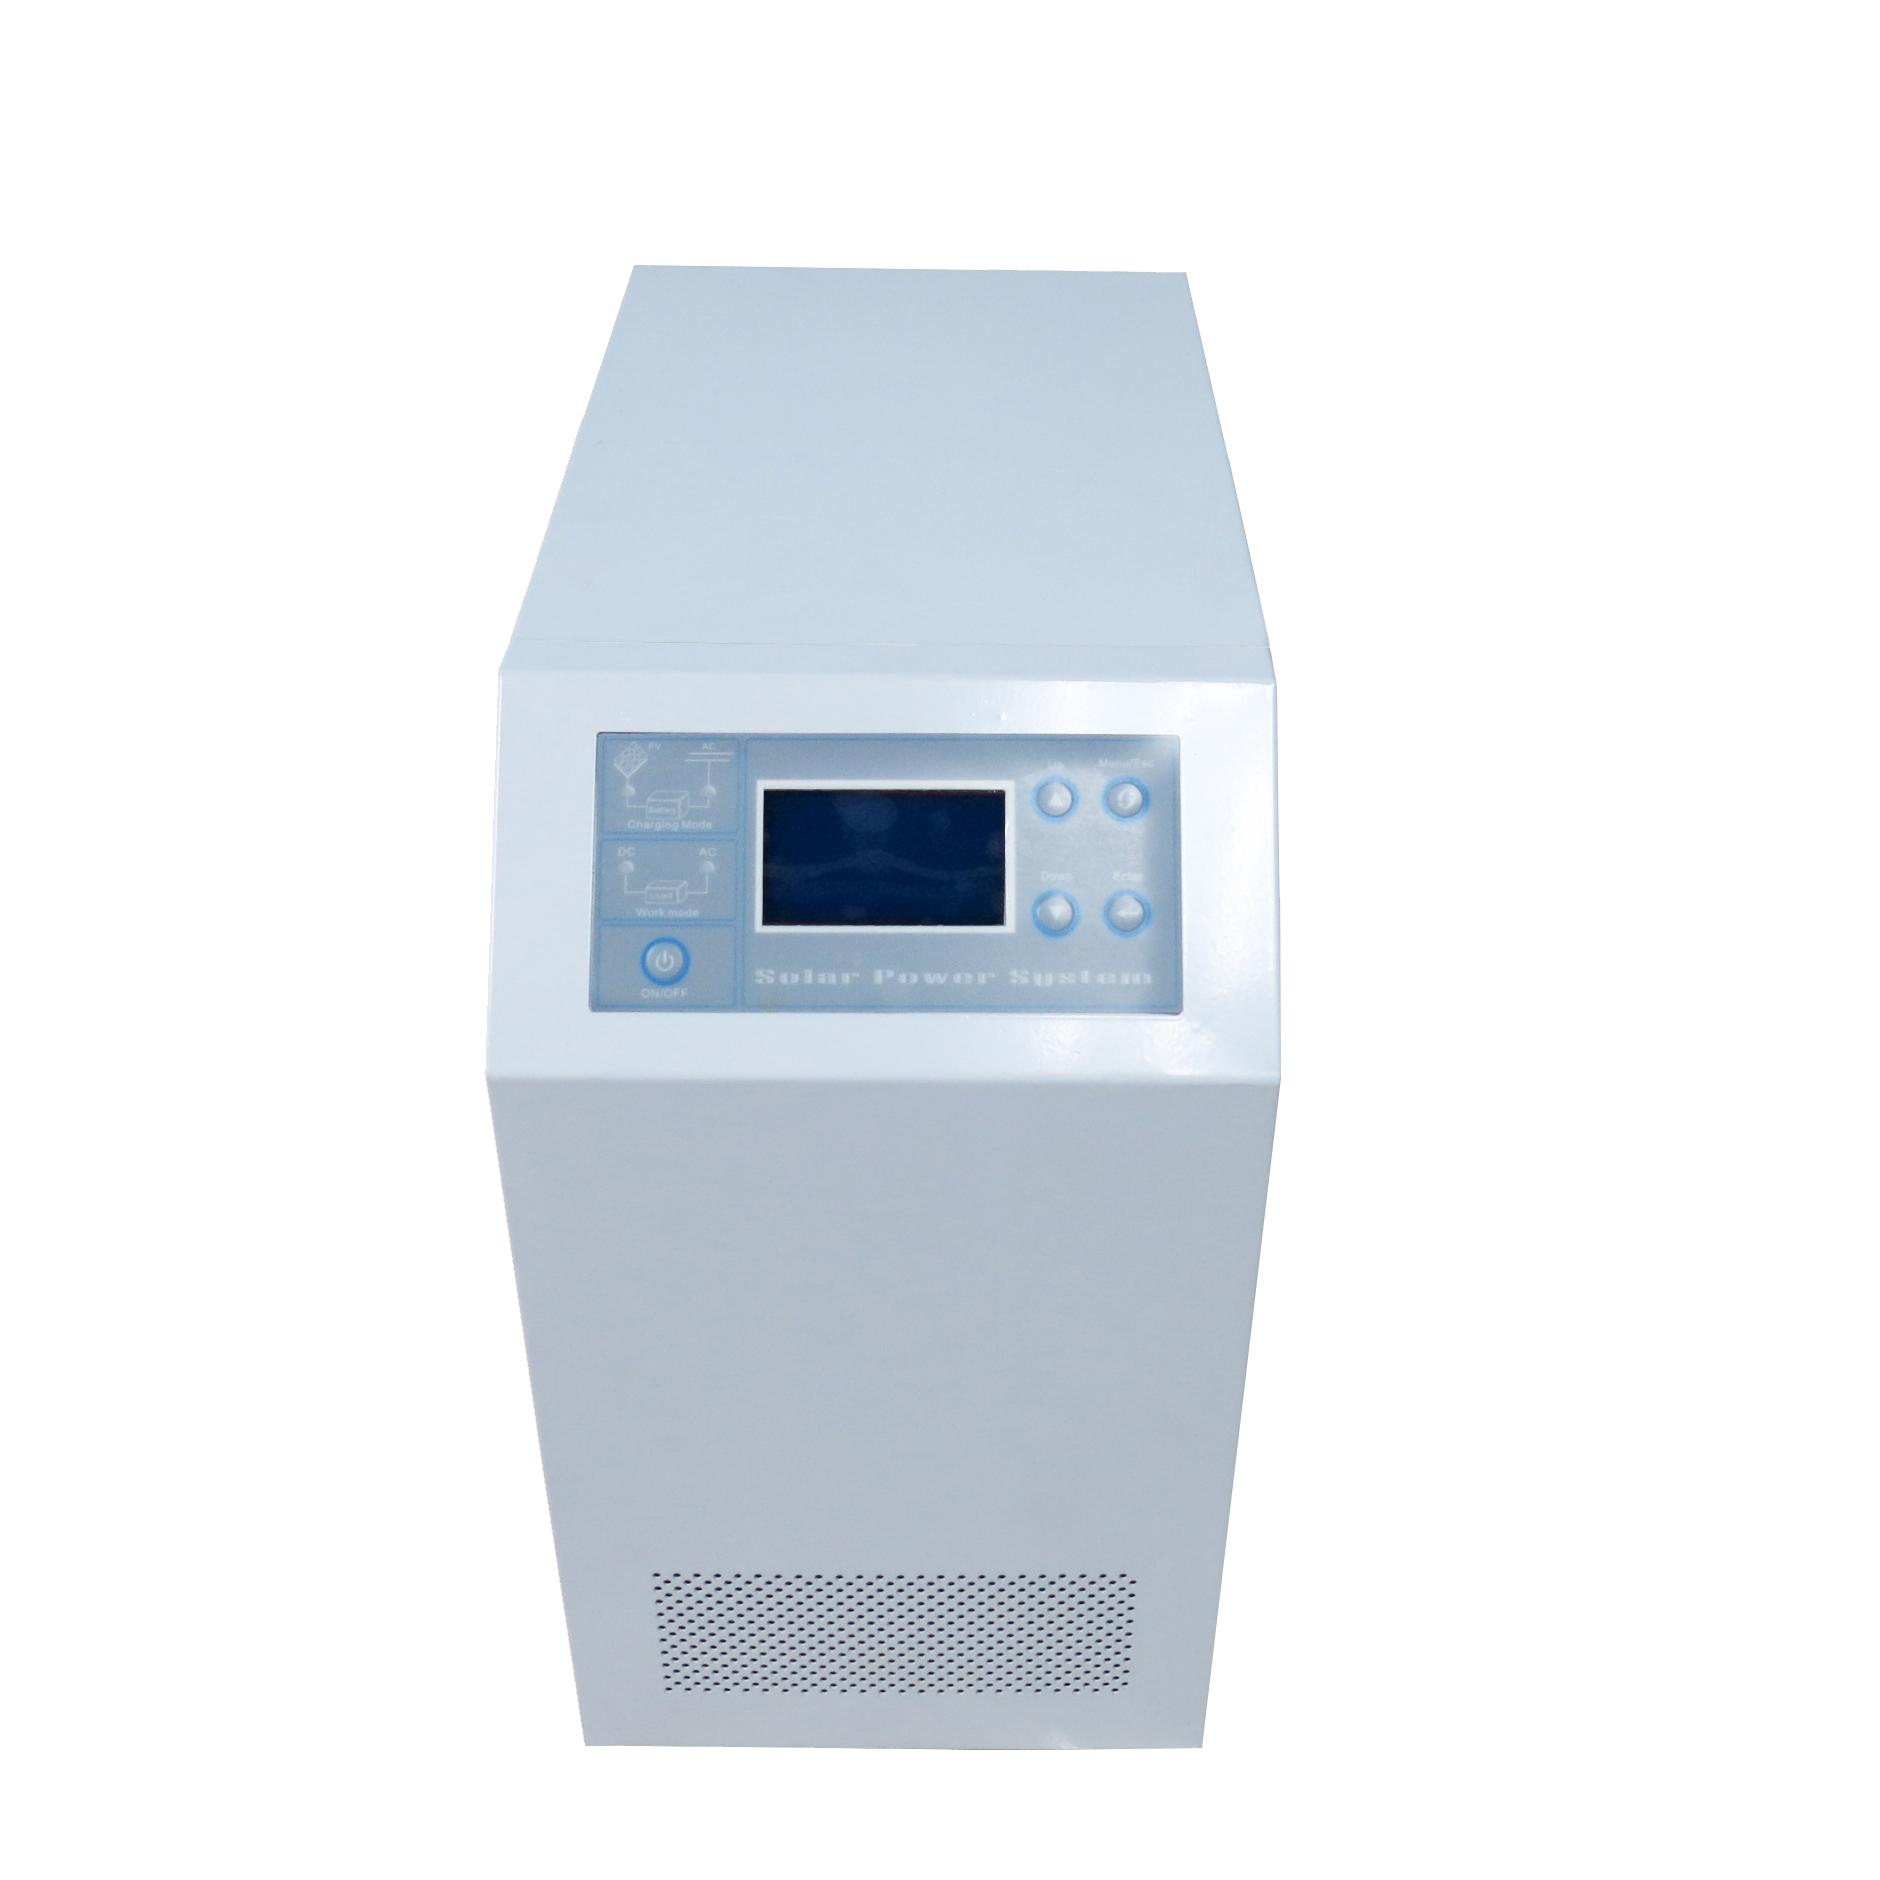 Dc 48v To Ac 220v 230v 240v 4kw Single Phase And Off Grid Inverter Circuit Diagram Of Power On 12v